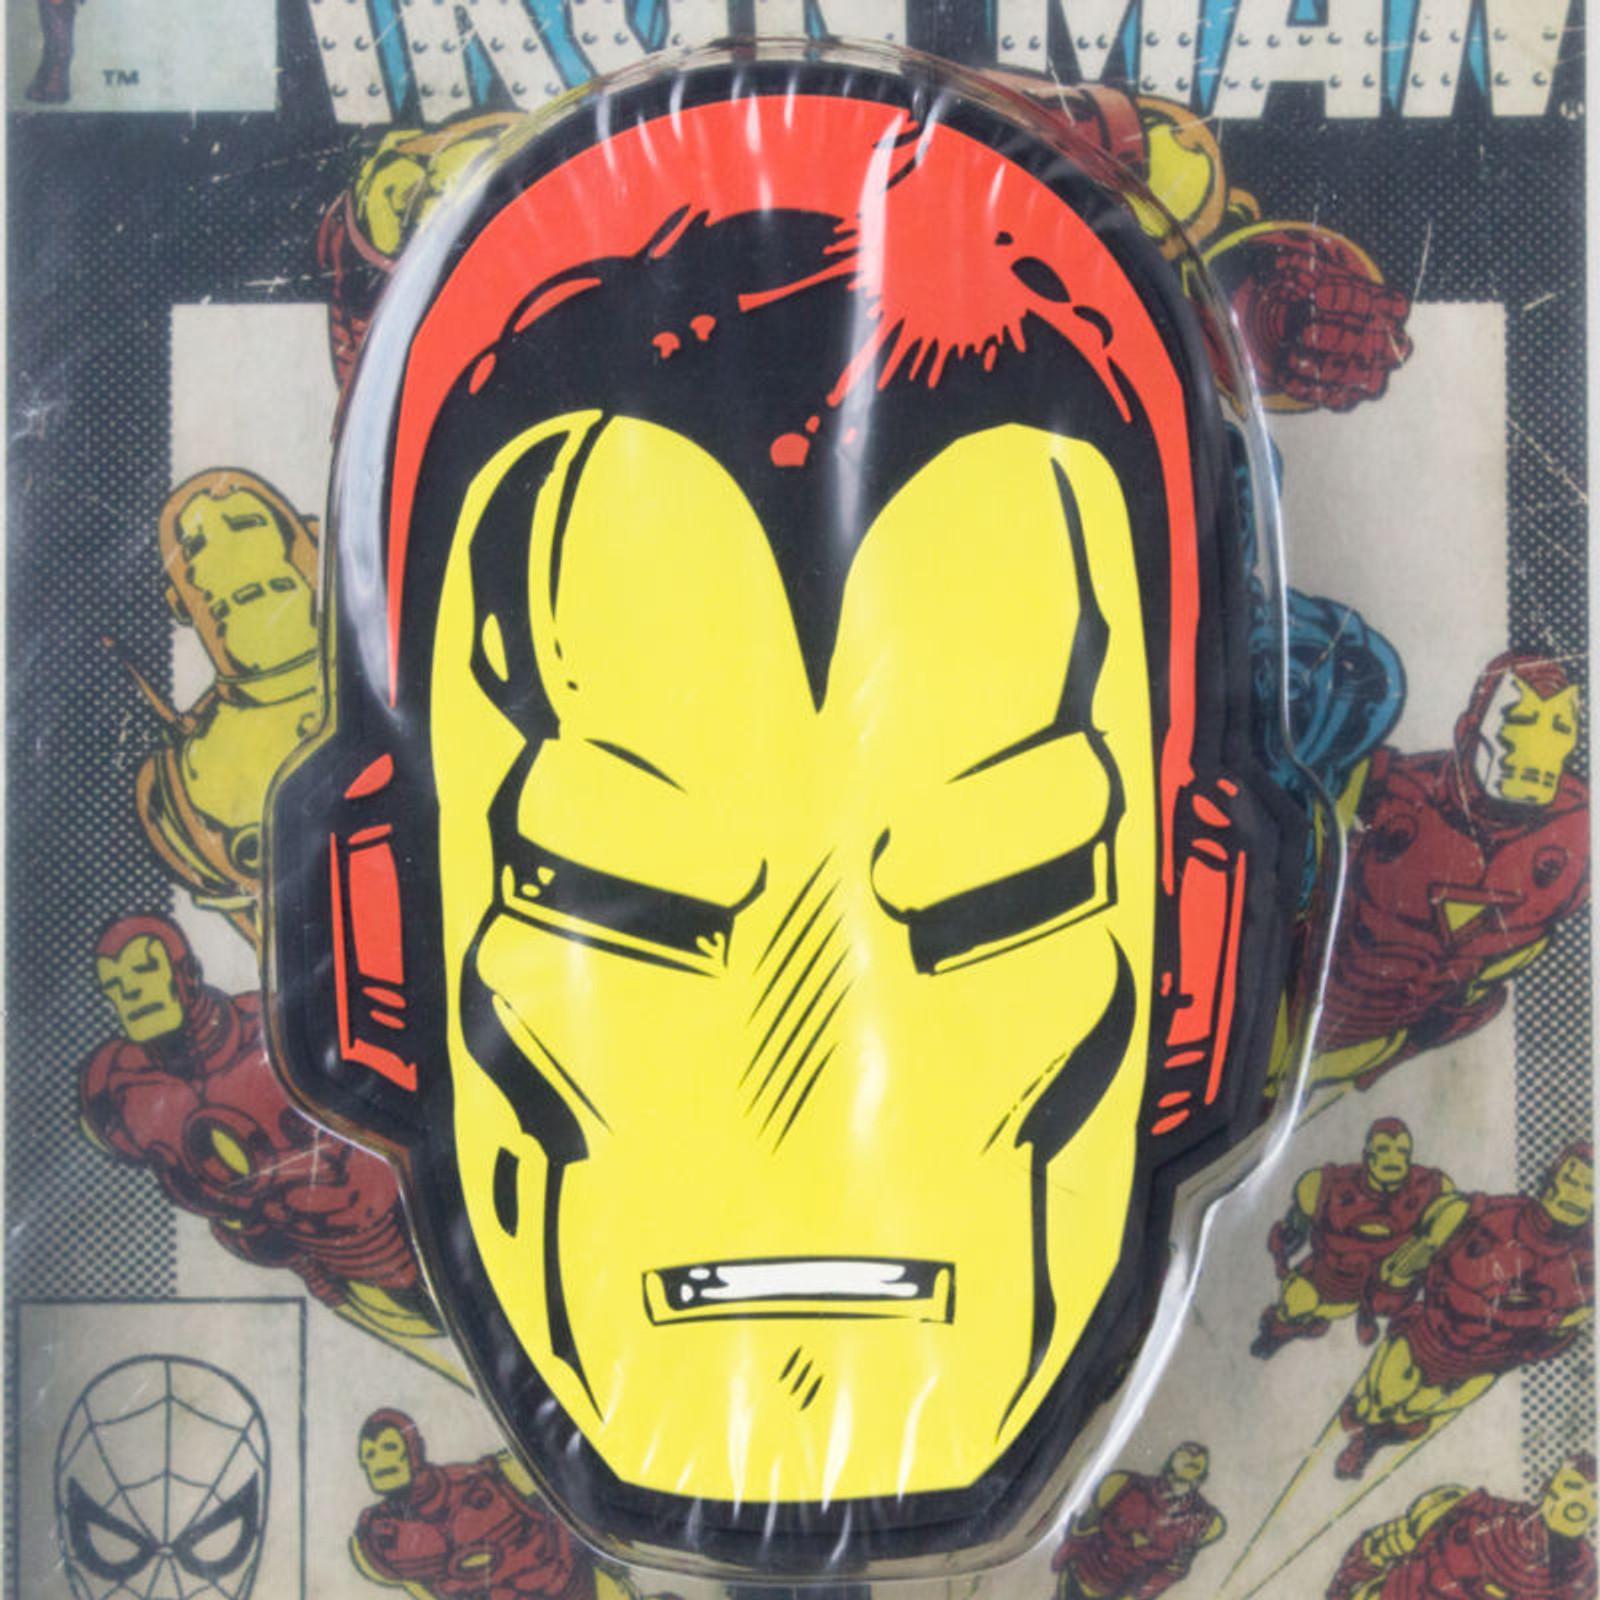 Marvel Rubber Magnet Iron Man Face Banpresto JAPAN ANIME COMICS